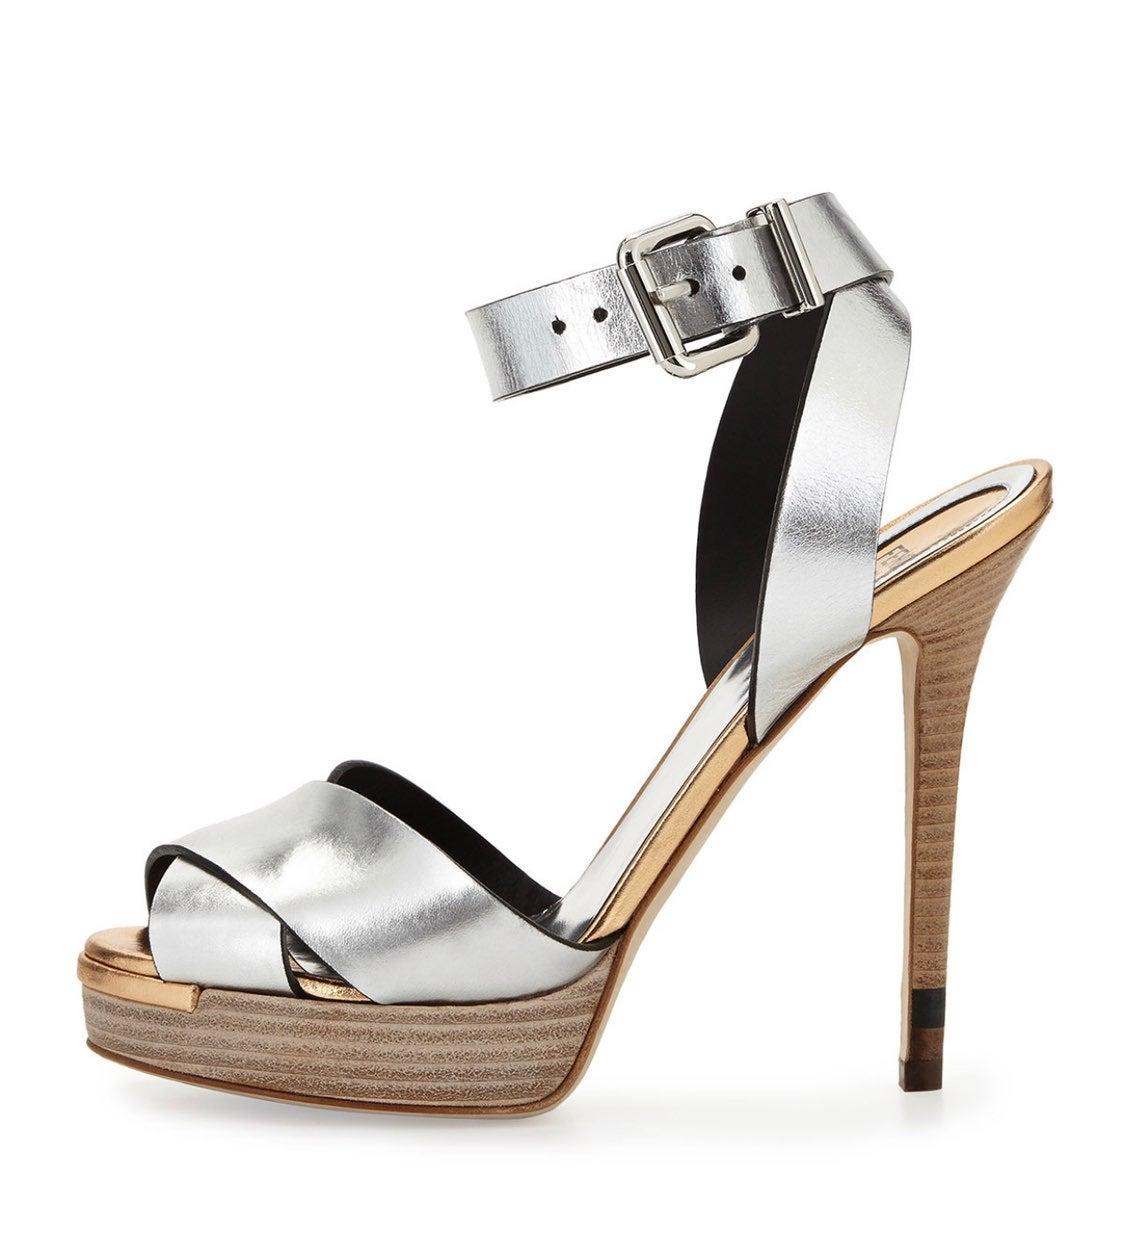 Fendi Criss Cross Ankle Strap Sandals